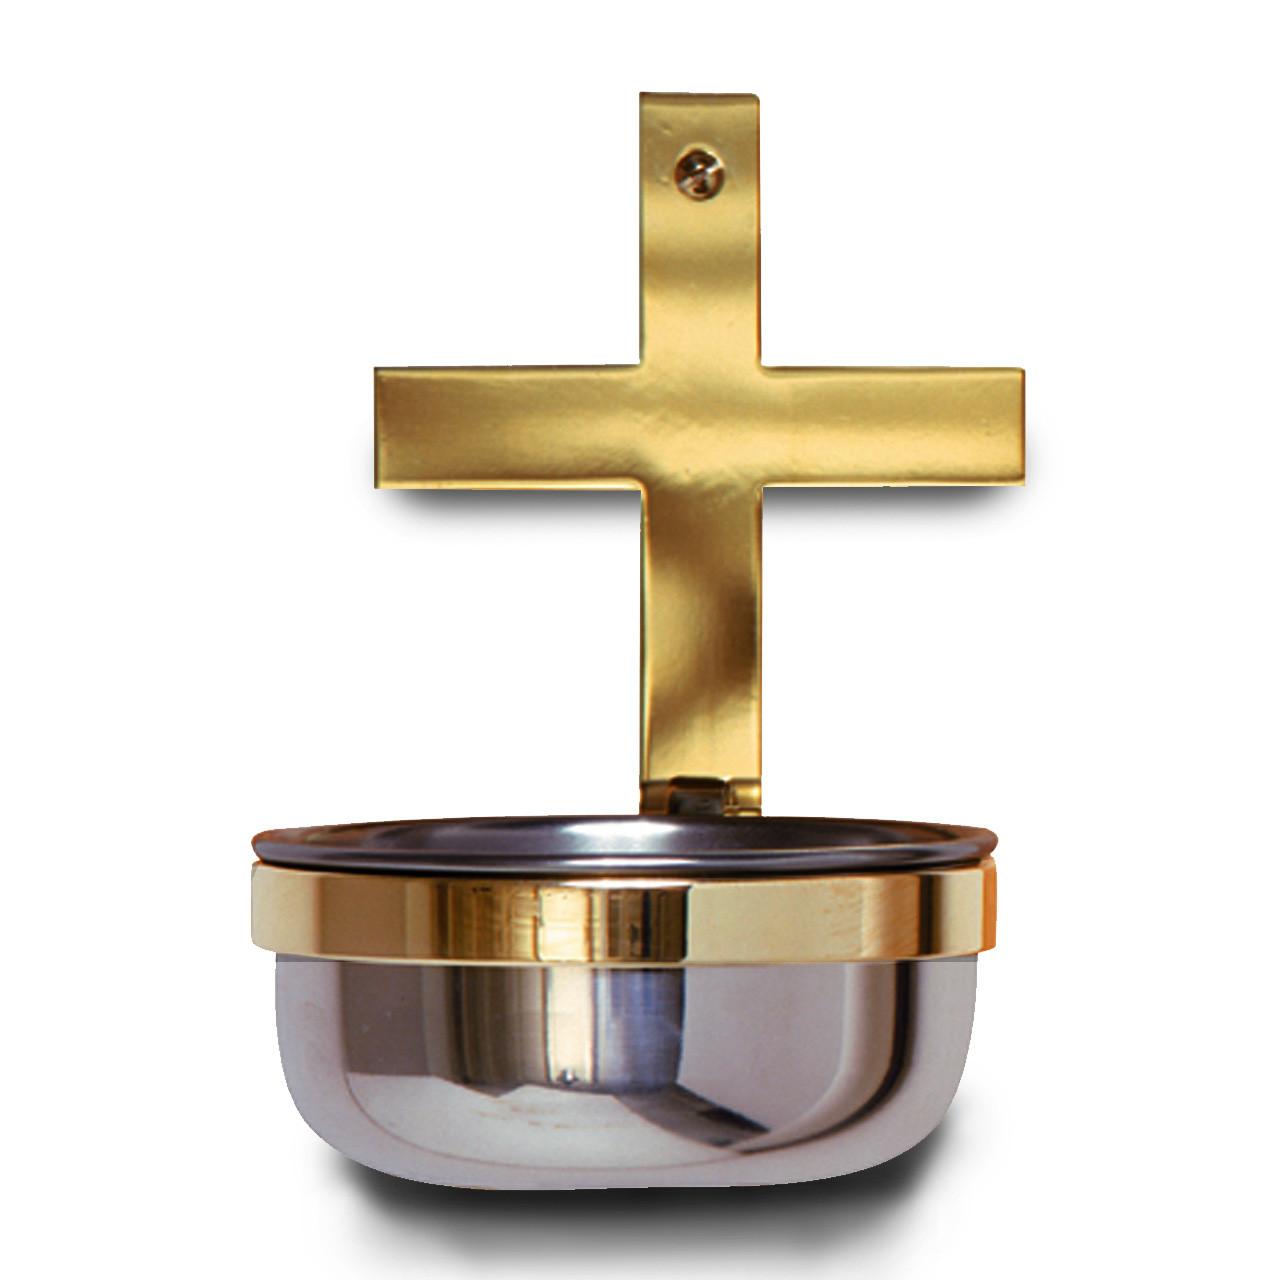 K249 Stainless Steel Holy Water Font w/Brass Cross